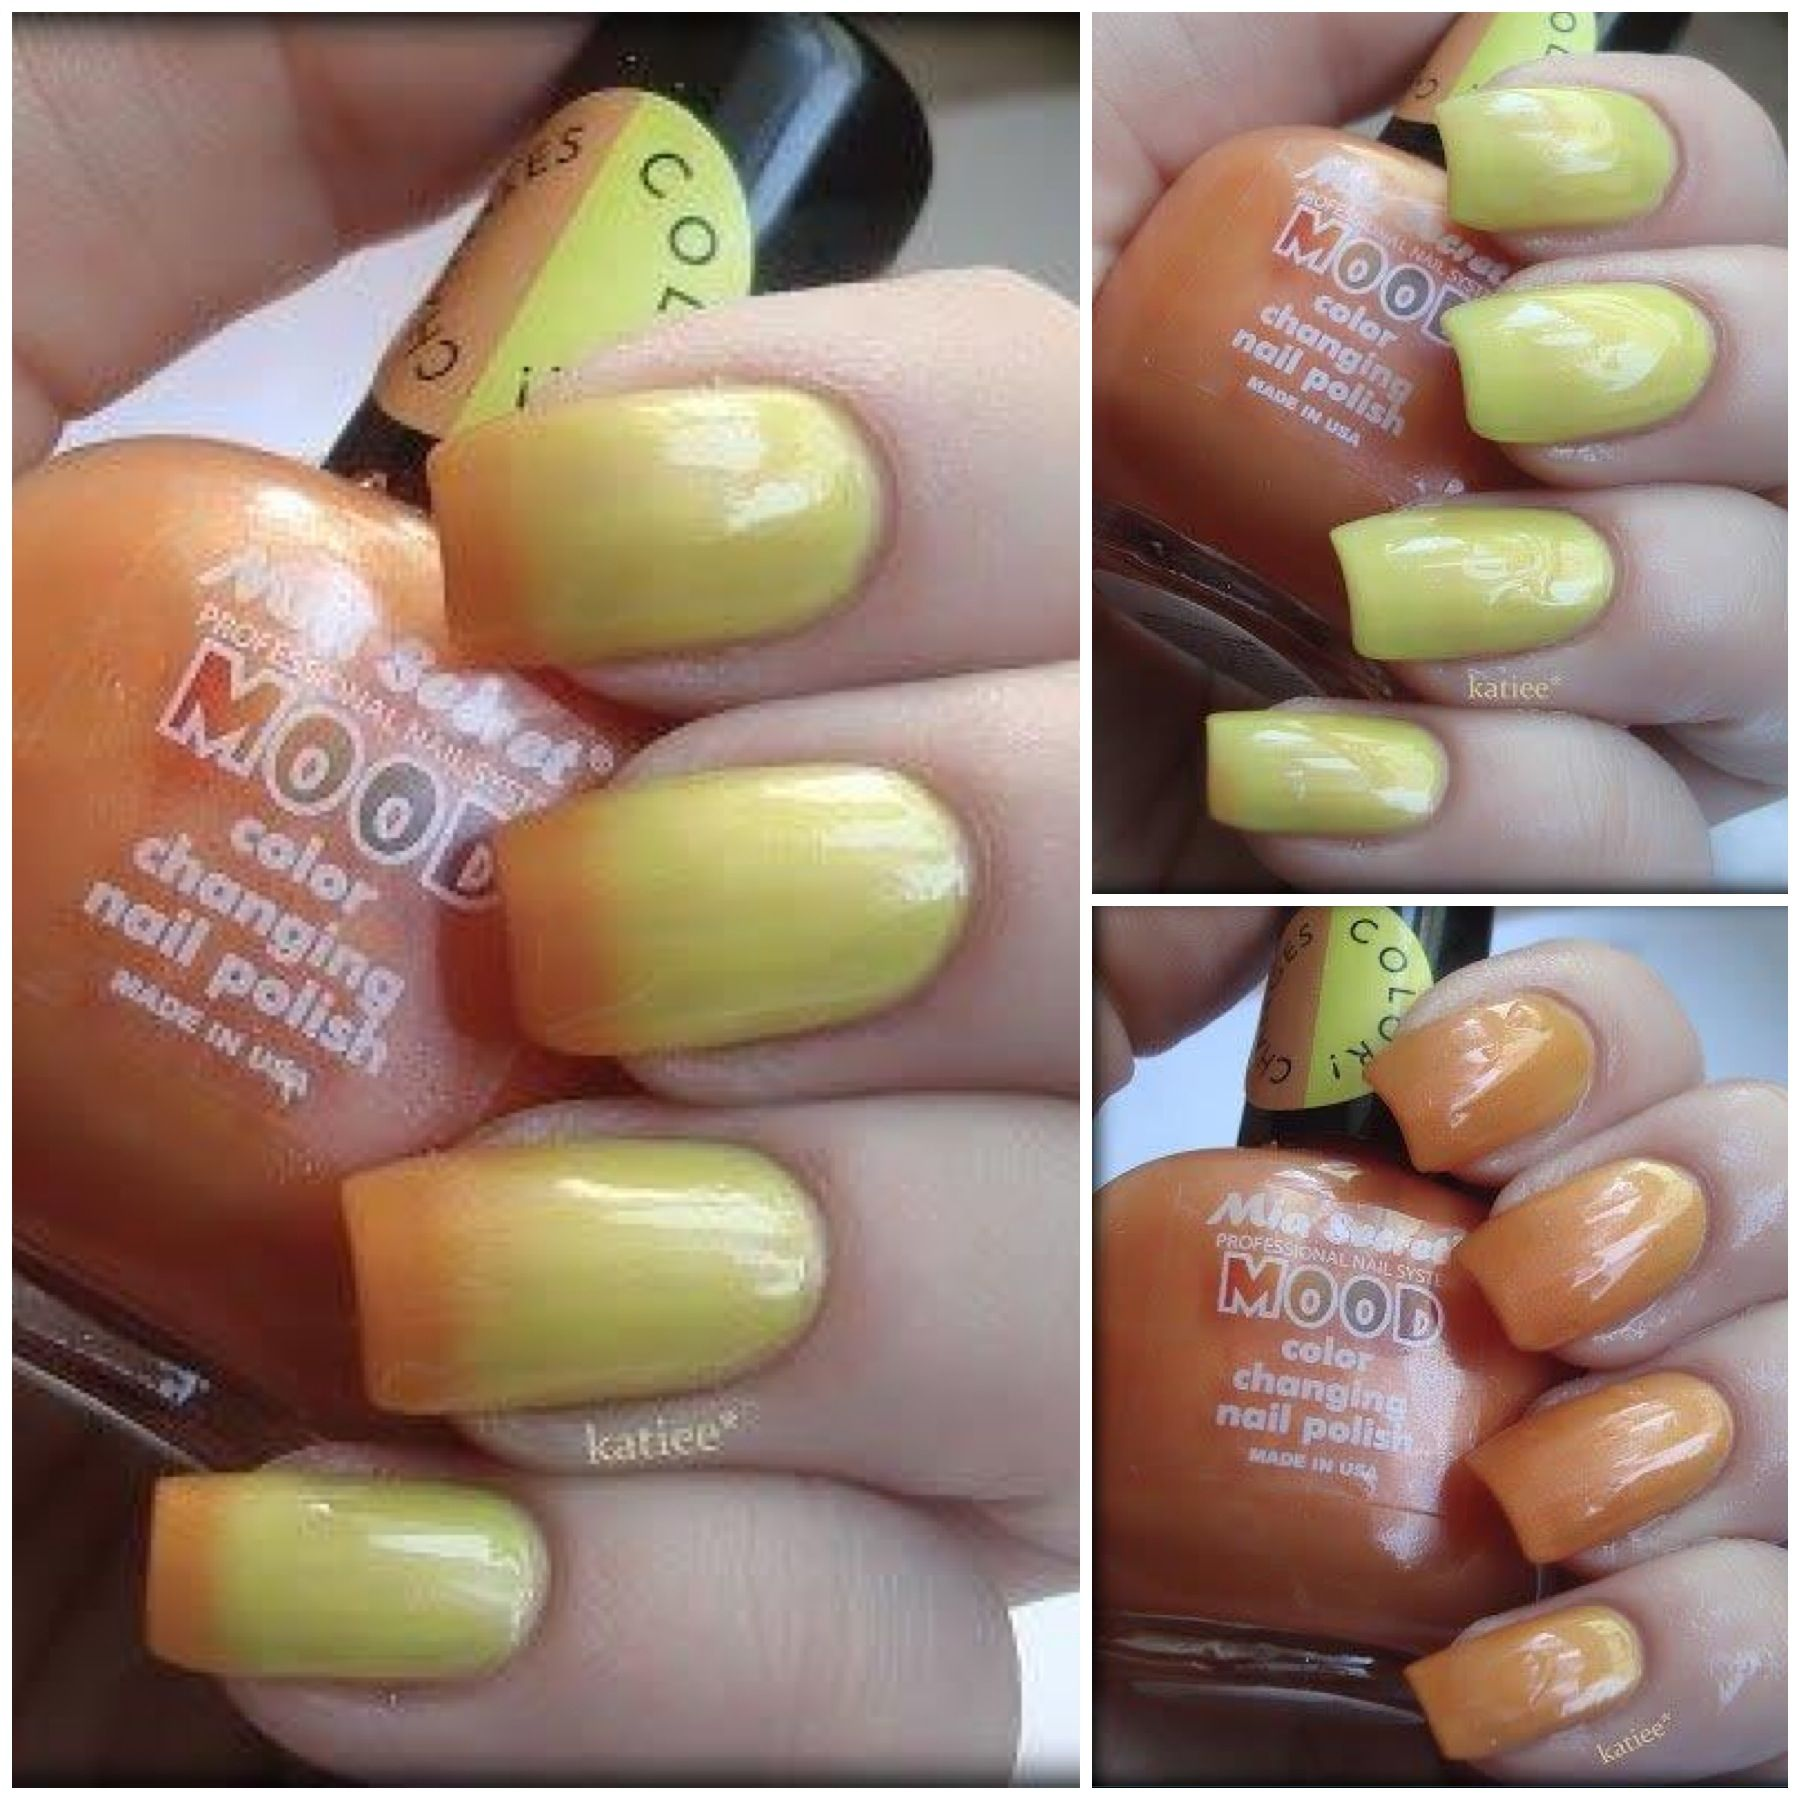 Mia Secret Papaya To Mango Mood Color Changing Nail Polish Miasecret